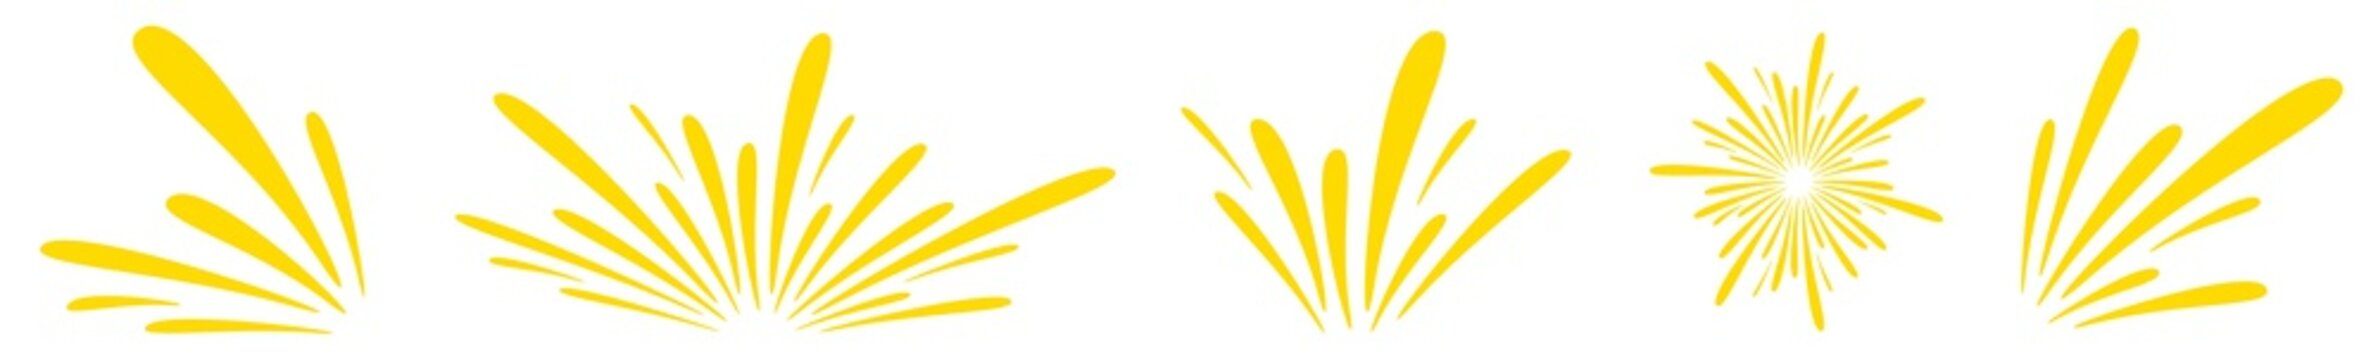 Splash Icon Yellow   Splashes   Droplets Symbol   Splashing Logo   Liquid Motion Sign   Isolated   Variations